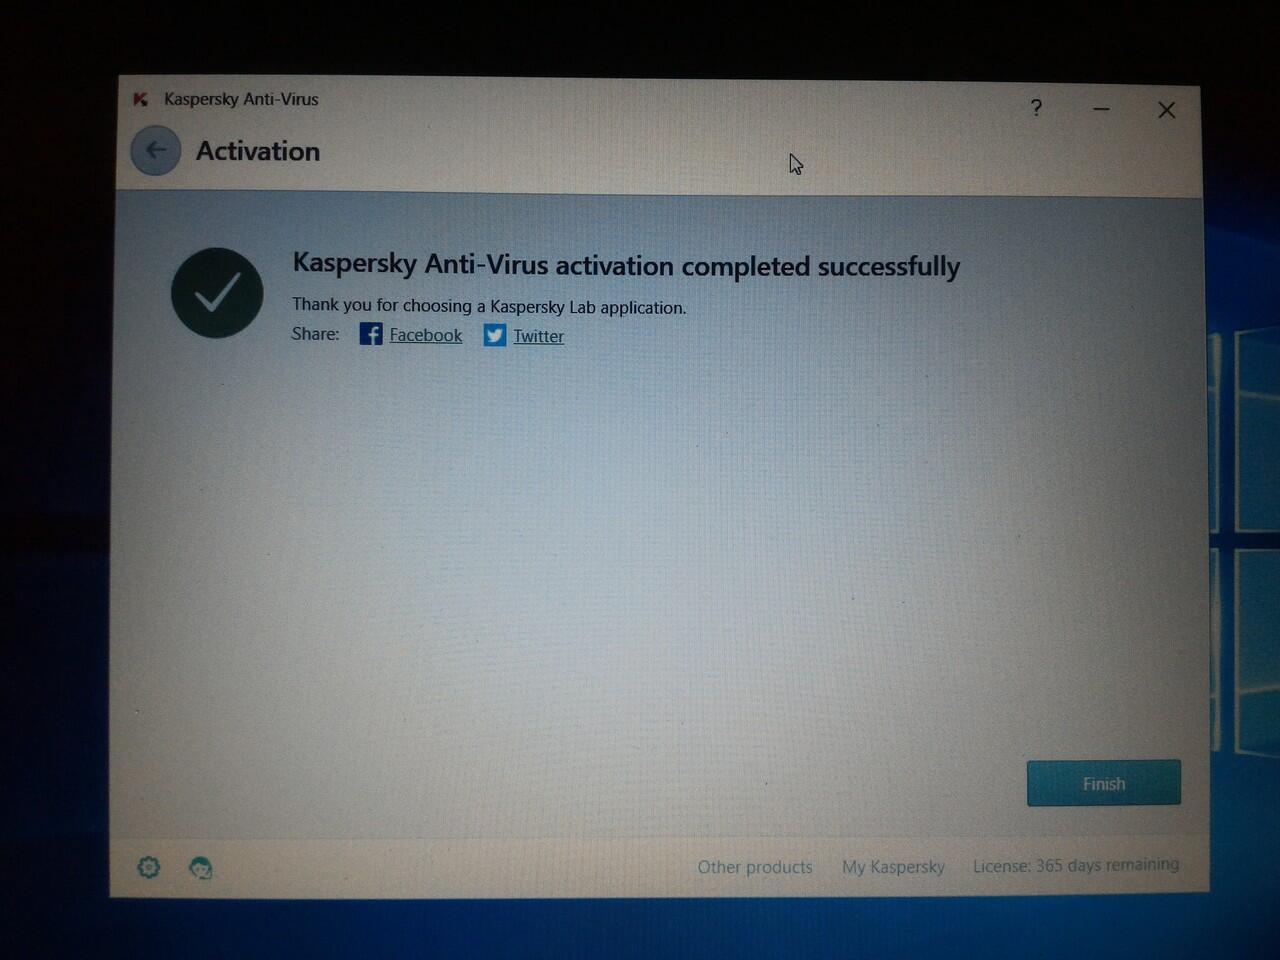 Jual Termurah Kaspersky Internet Security 2018 Kis Cuma 100rb Antivirus 4 Pc 2 Thn An Spesial Kaskuser